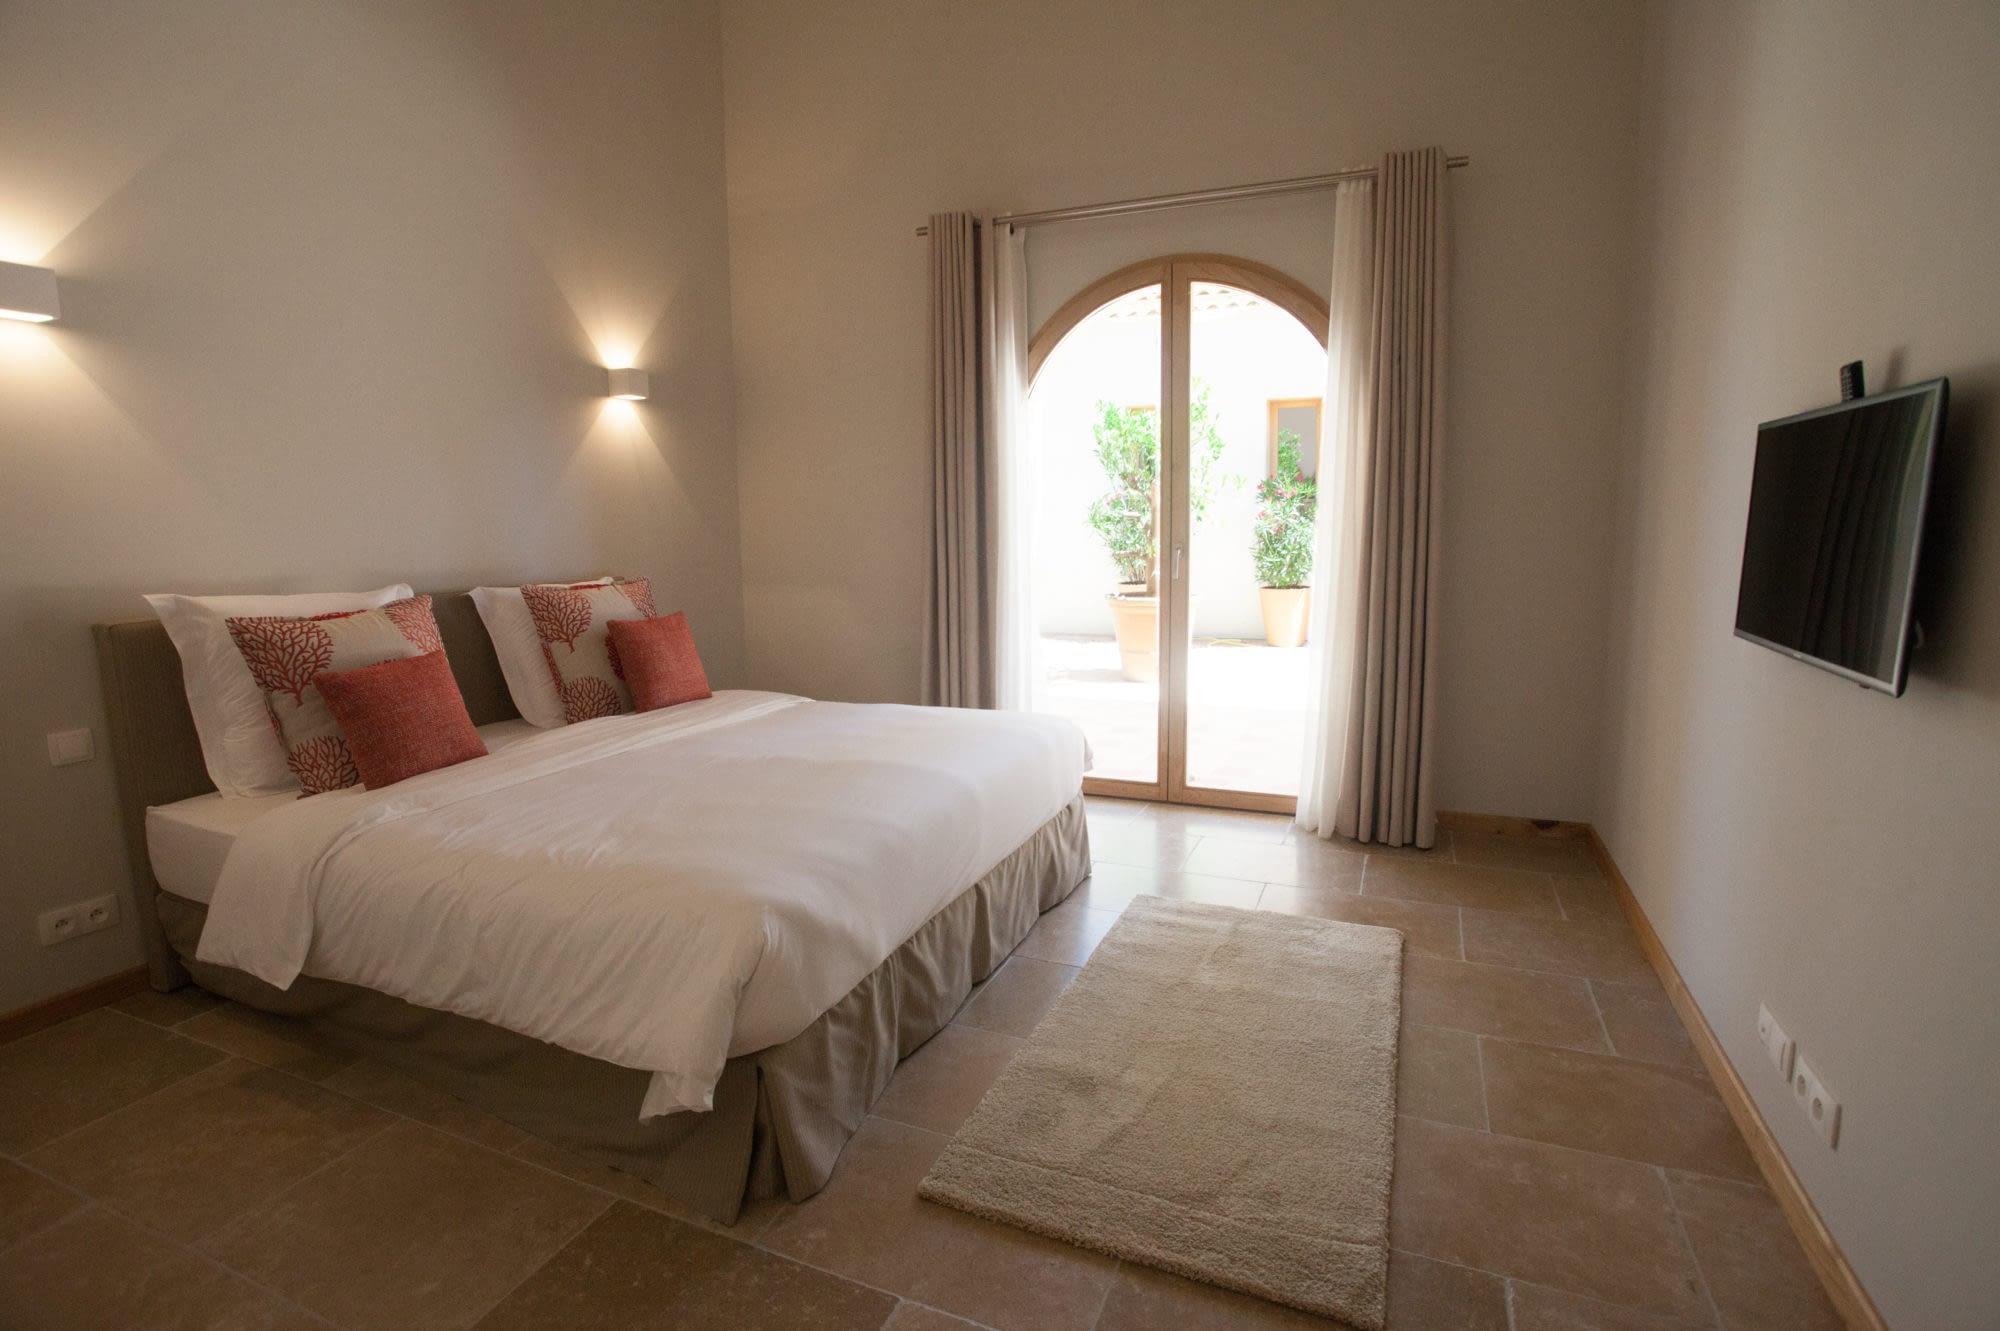 Chambre Le citronnier / Bedroom in the house Le citronnier